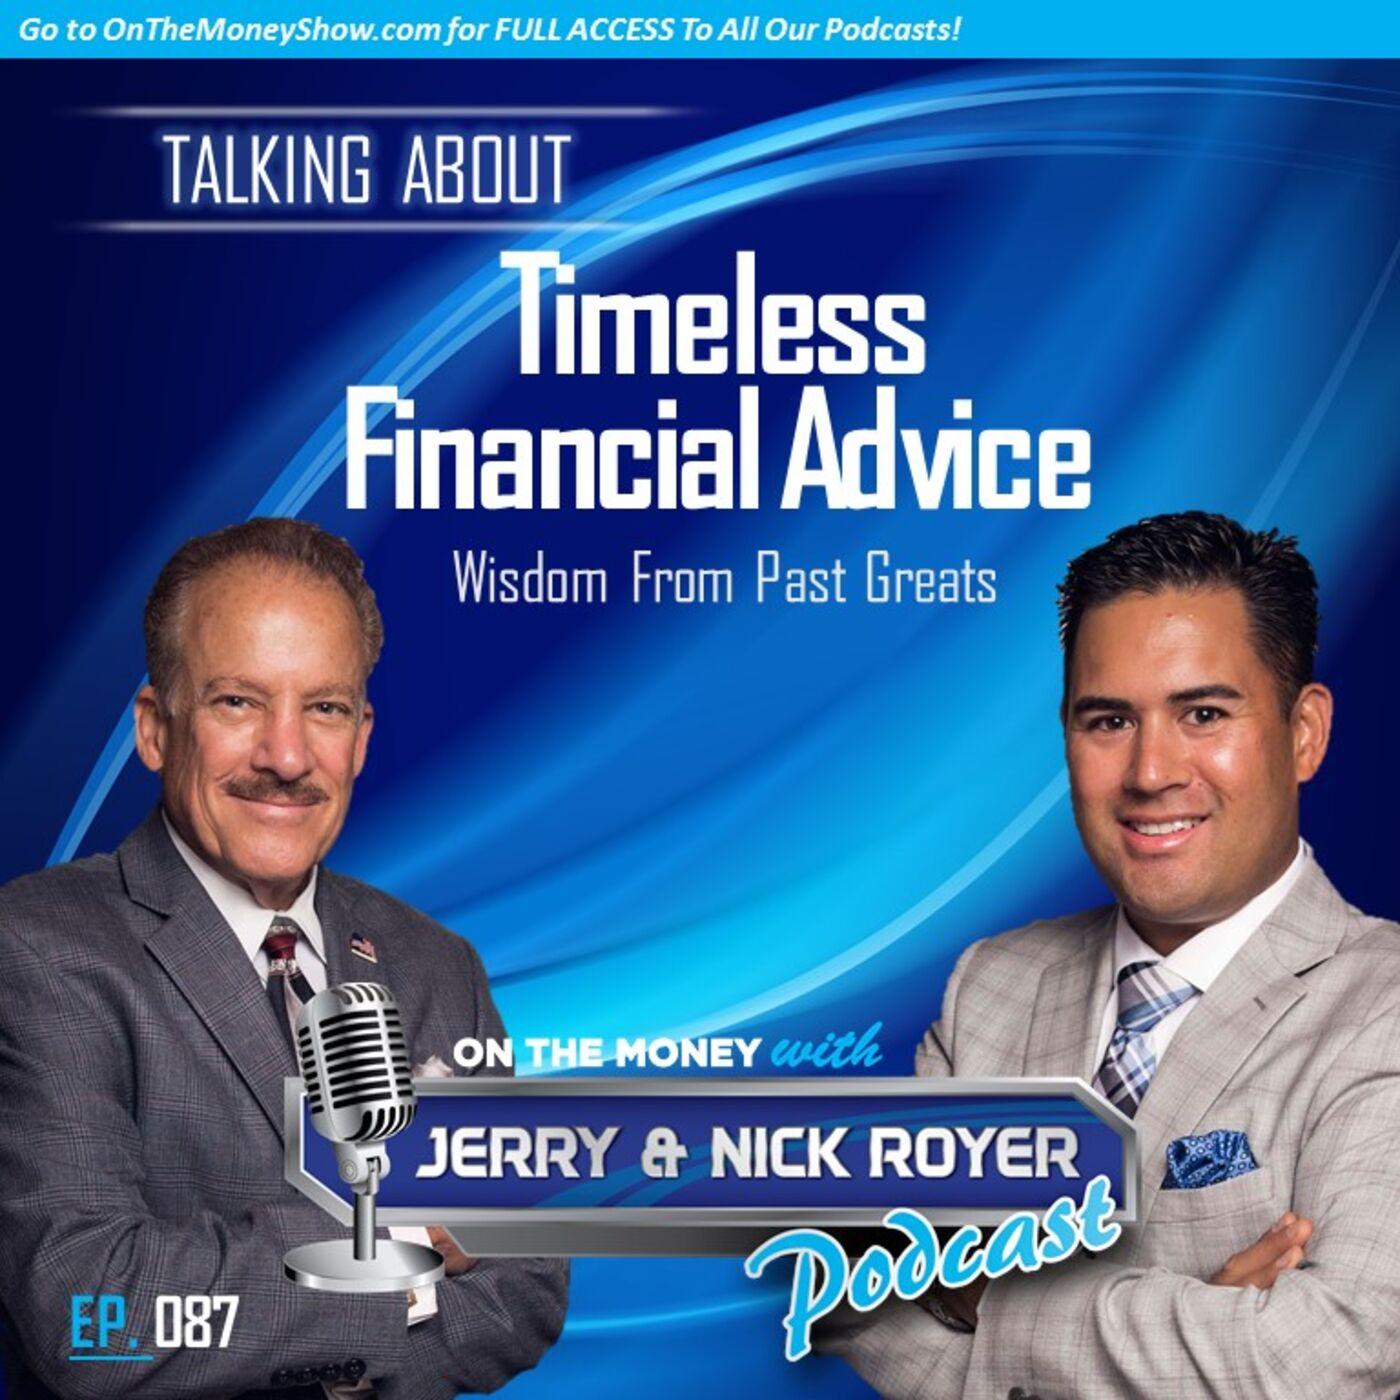 Episode #87: Timeless Financial Advice